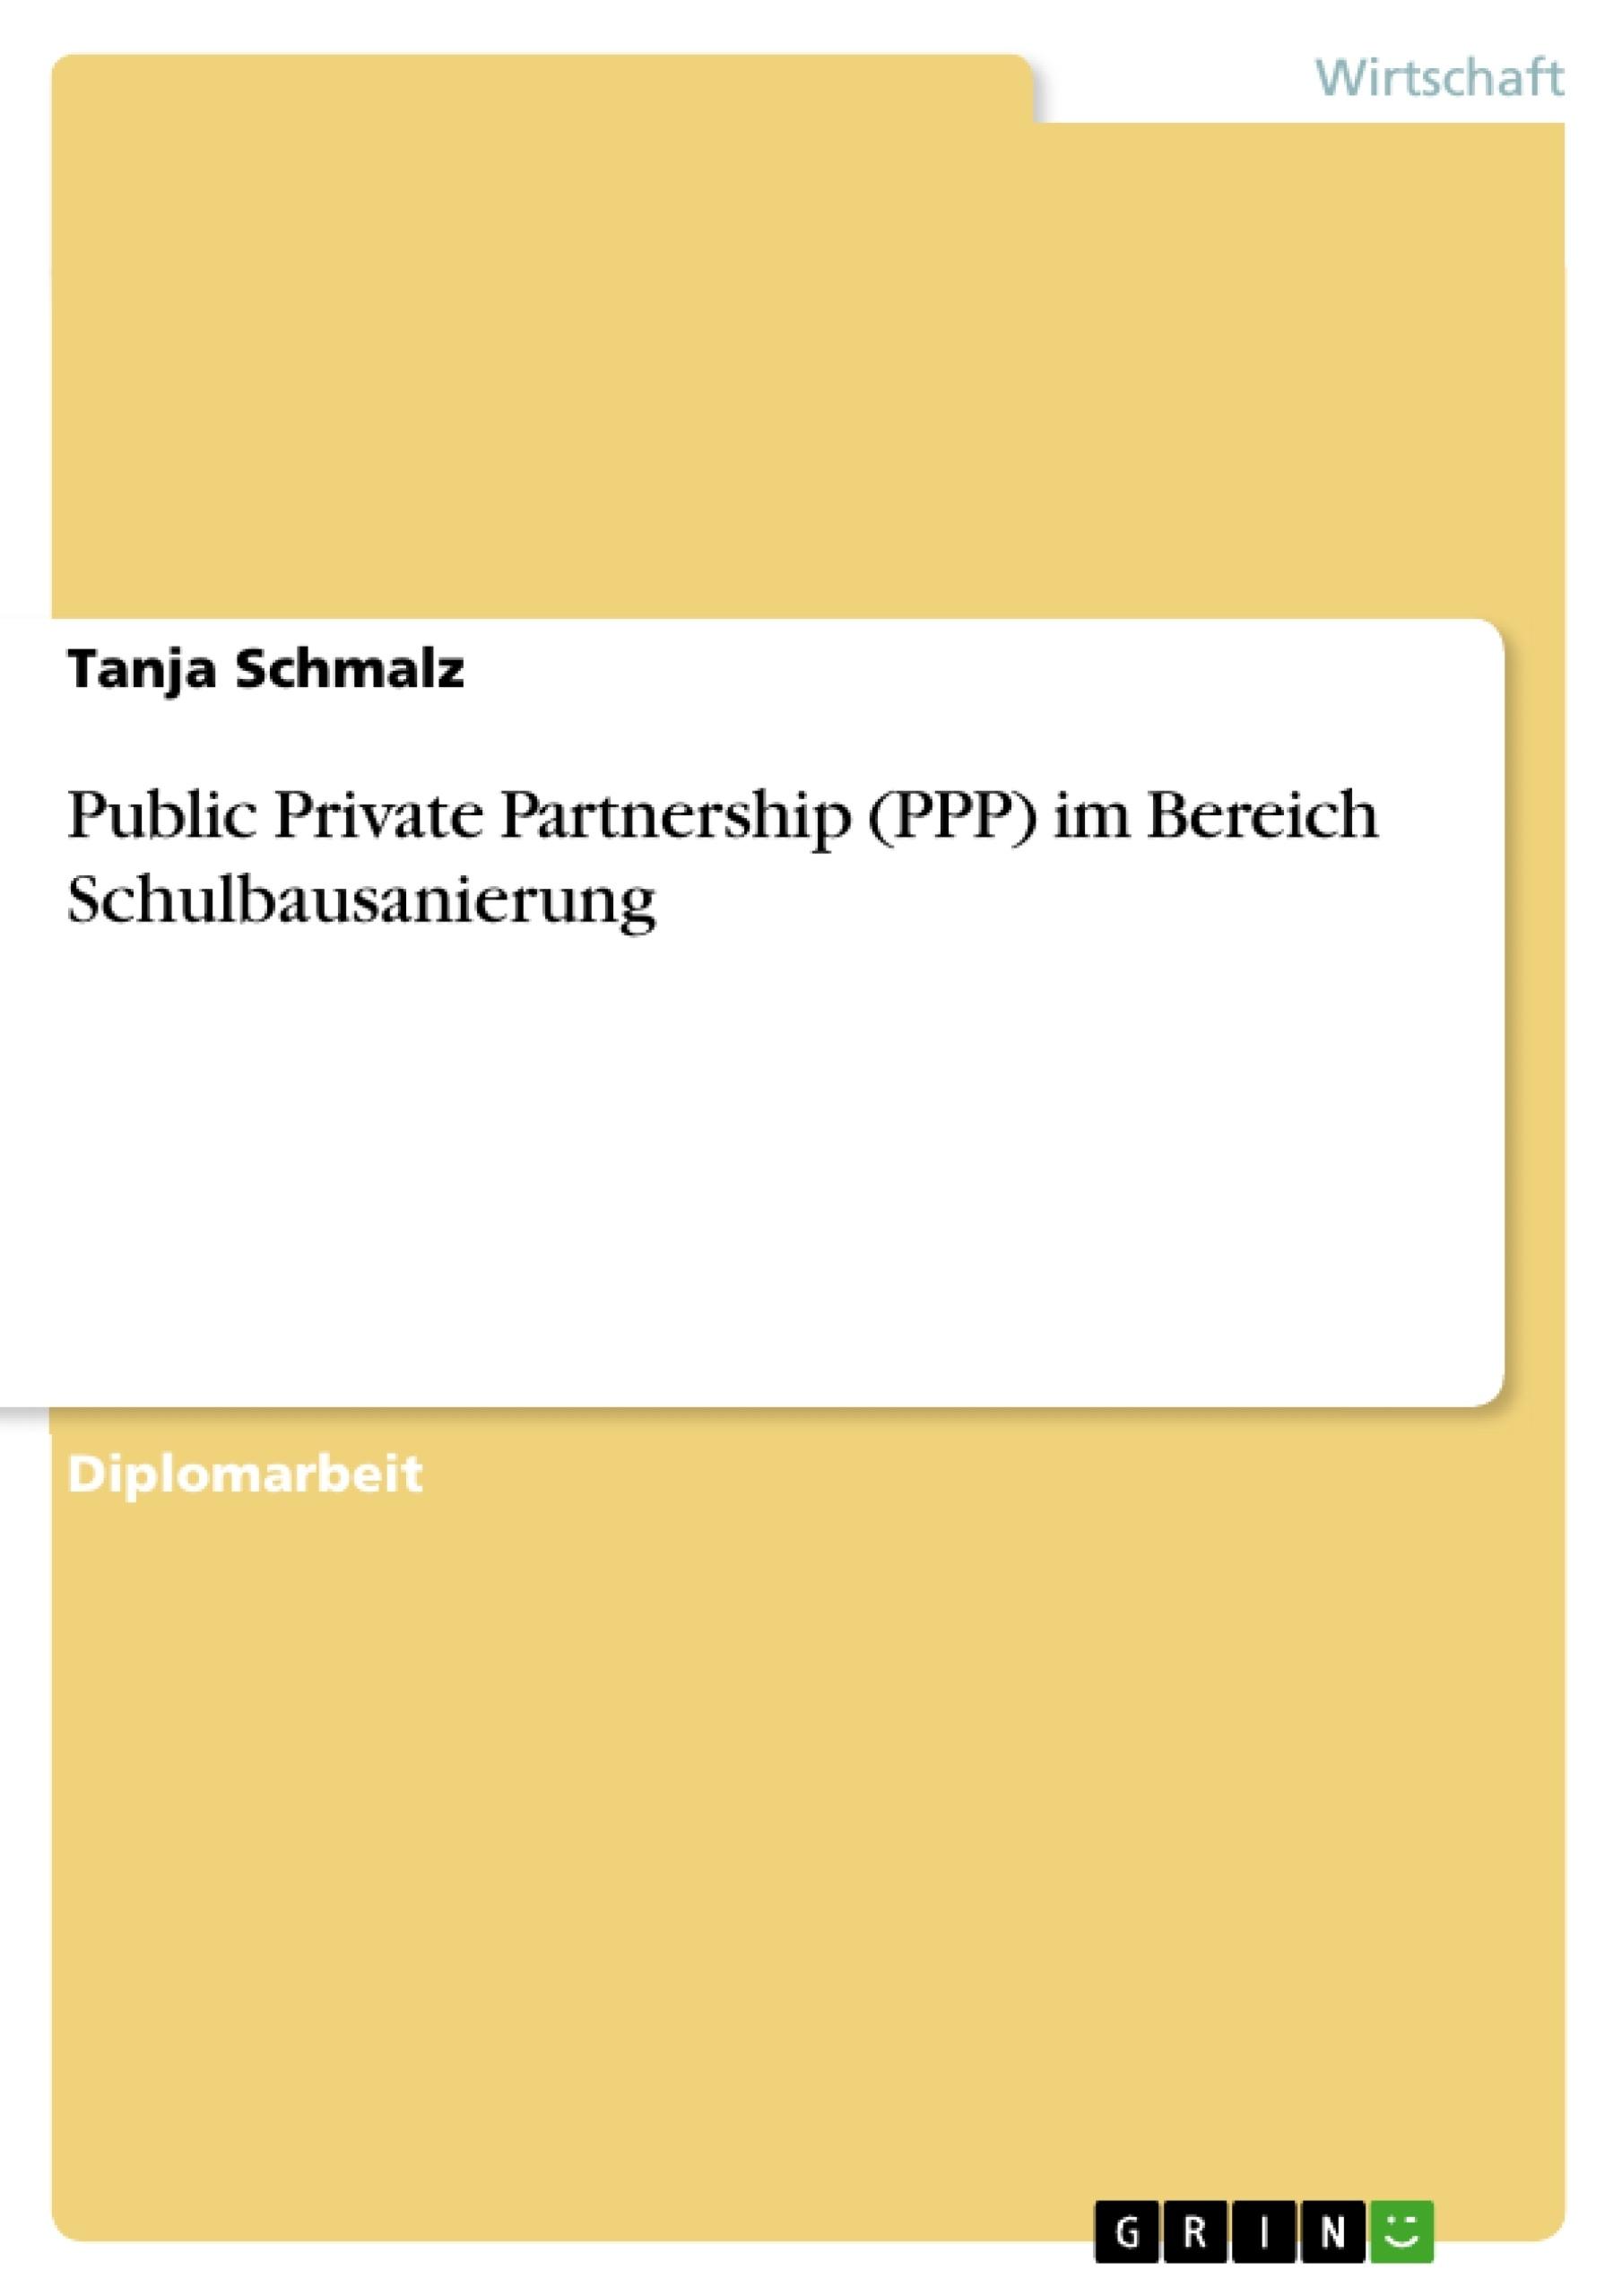 Titel: Public Private Partnership (PPP) im Bereich Schulbausanierung